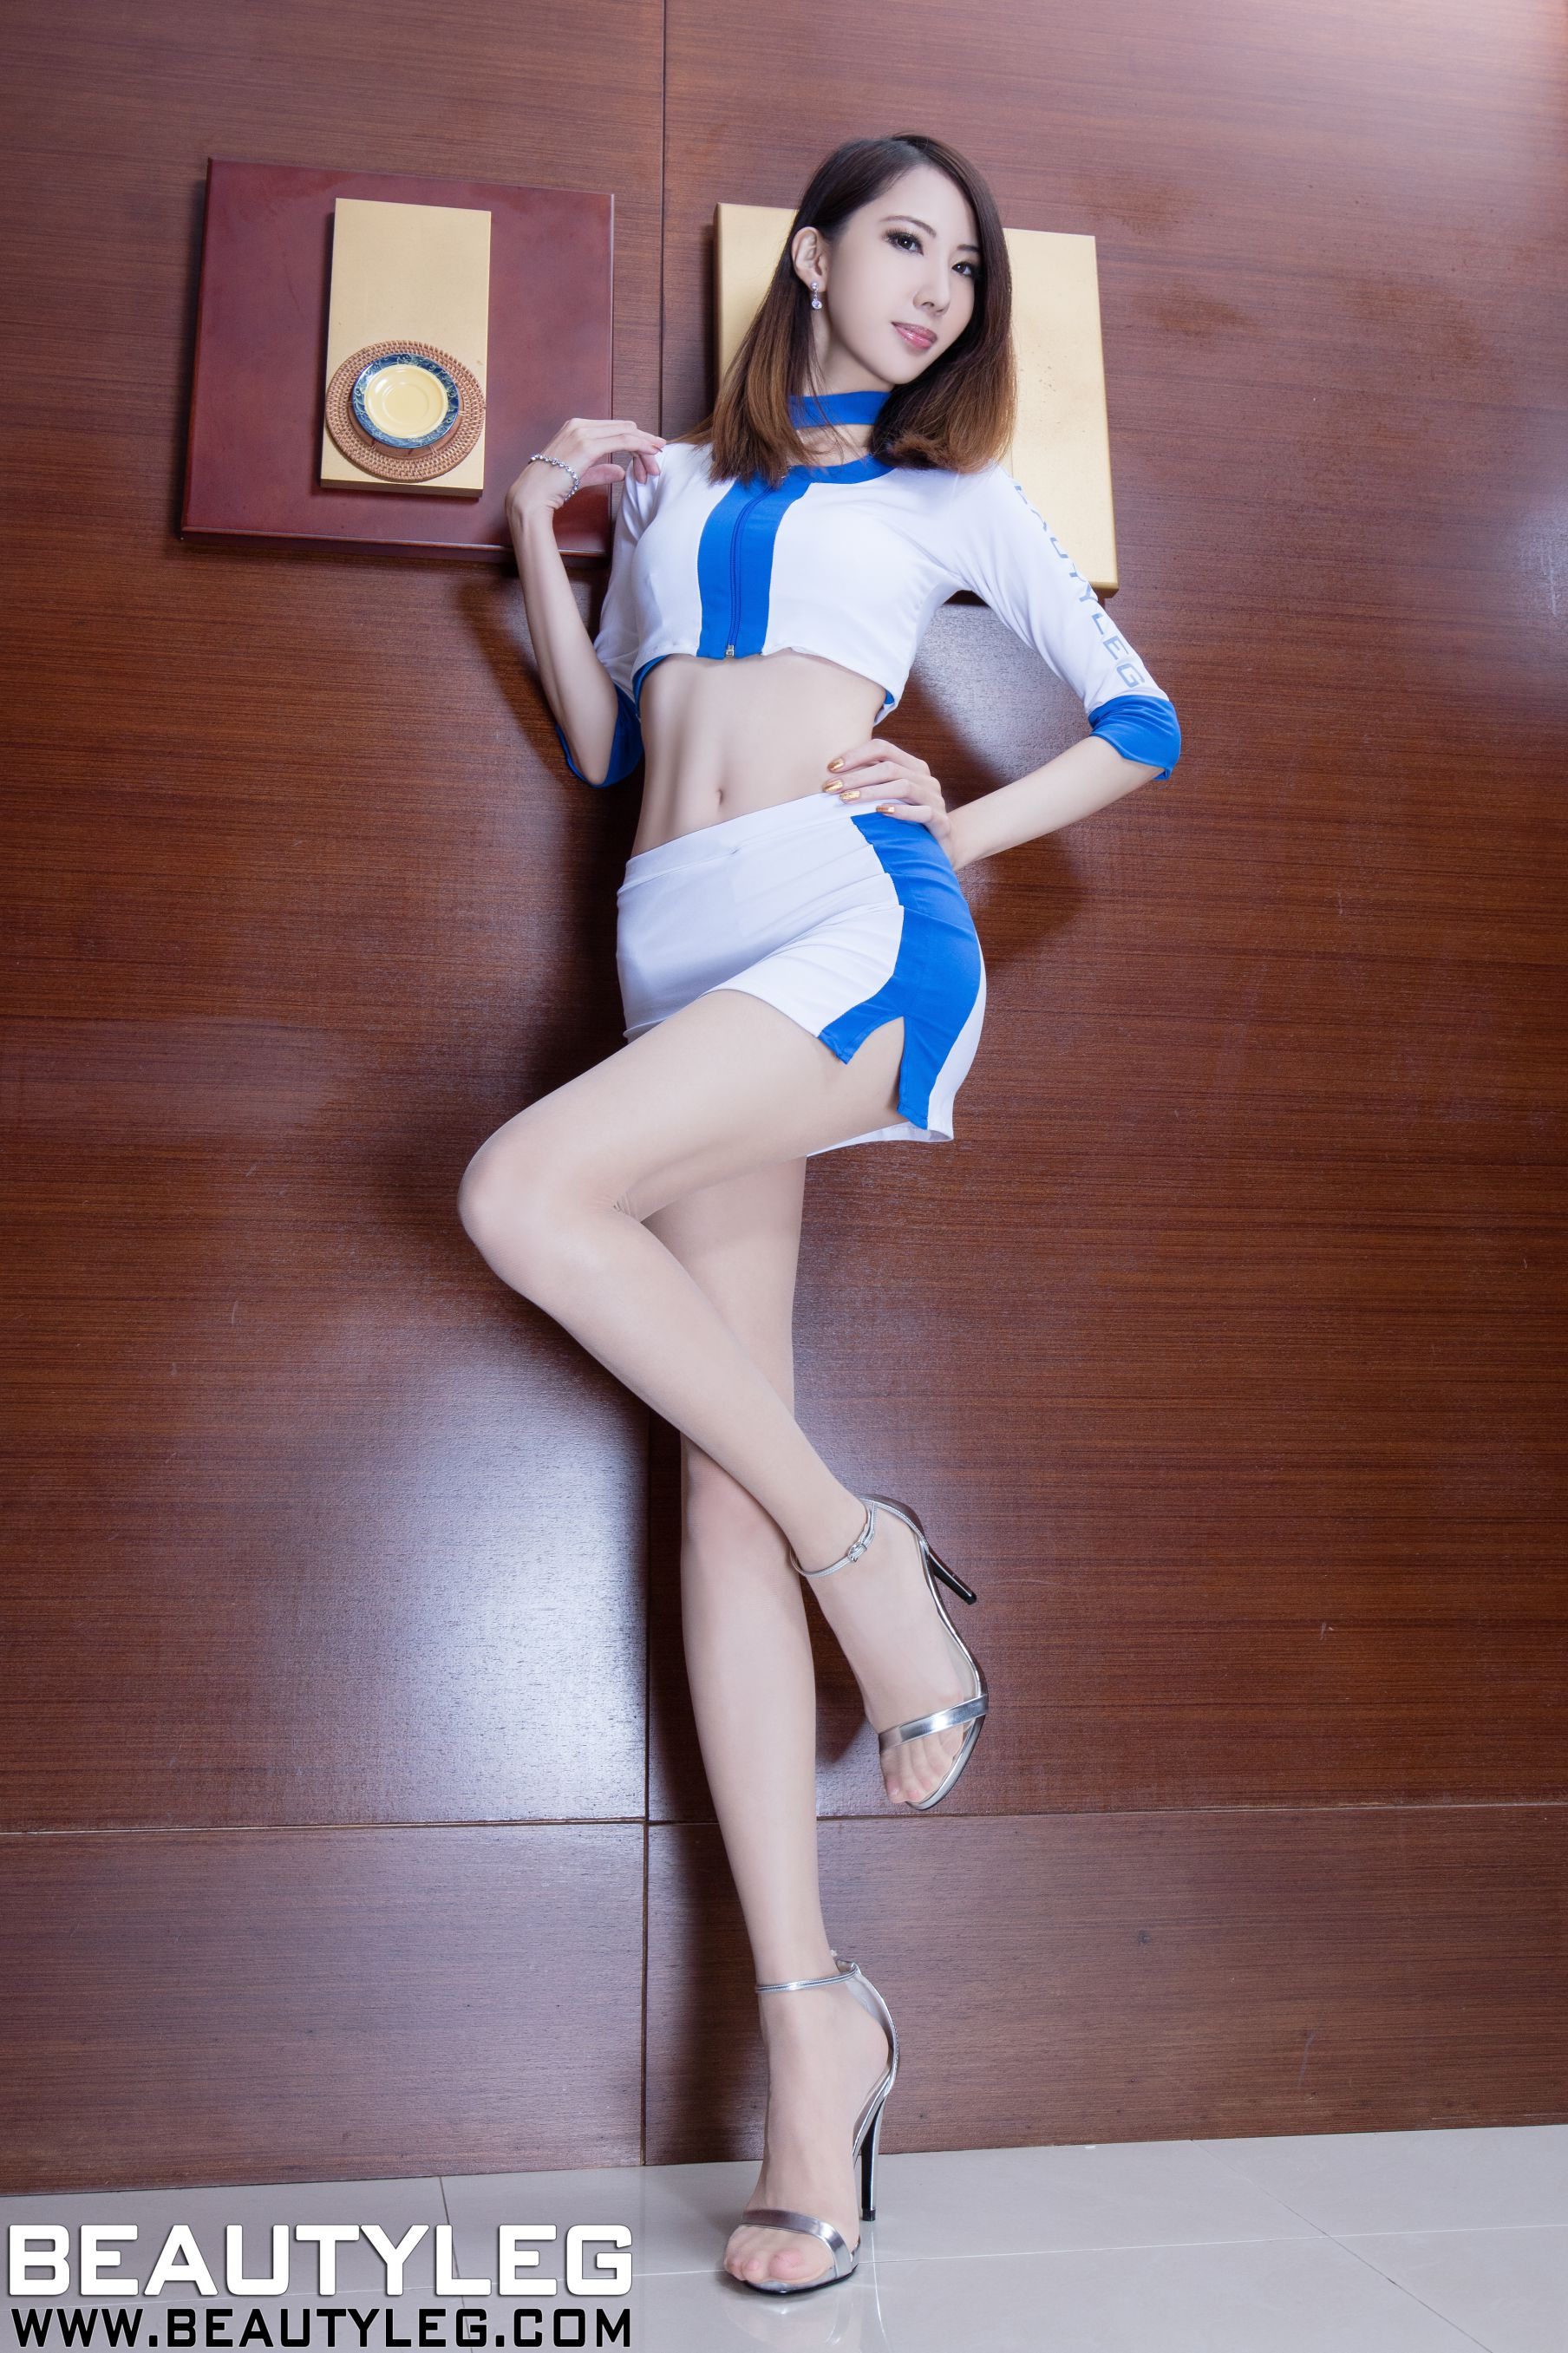 VOL.1538 [Beautyleg]丝袜美女:童采萱(Beautyleg Yoyo,腿模Yoyo)高品质写真套图(54P)